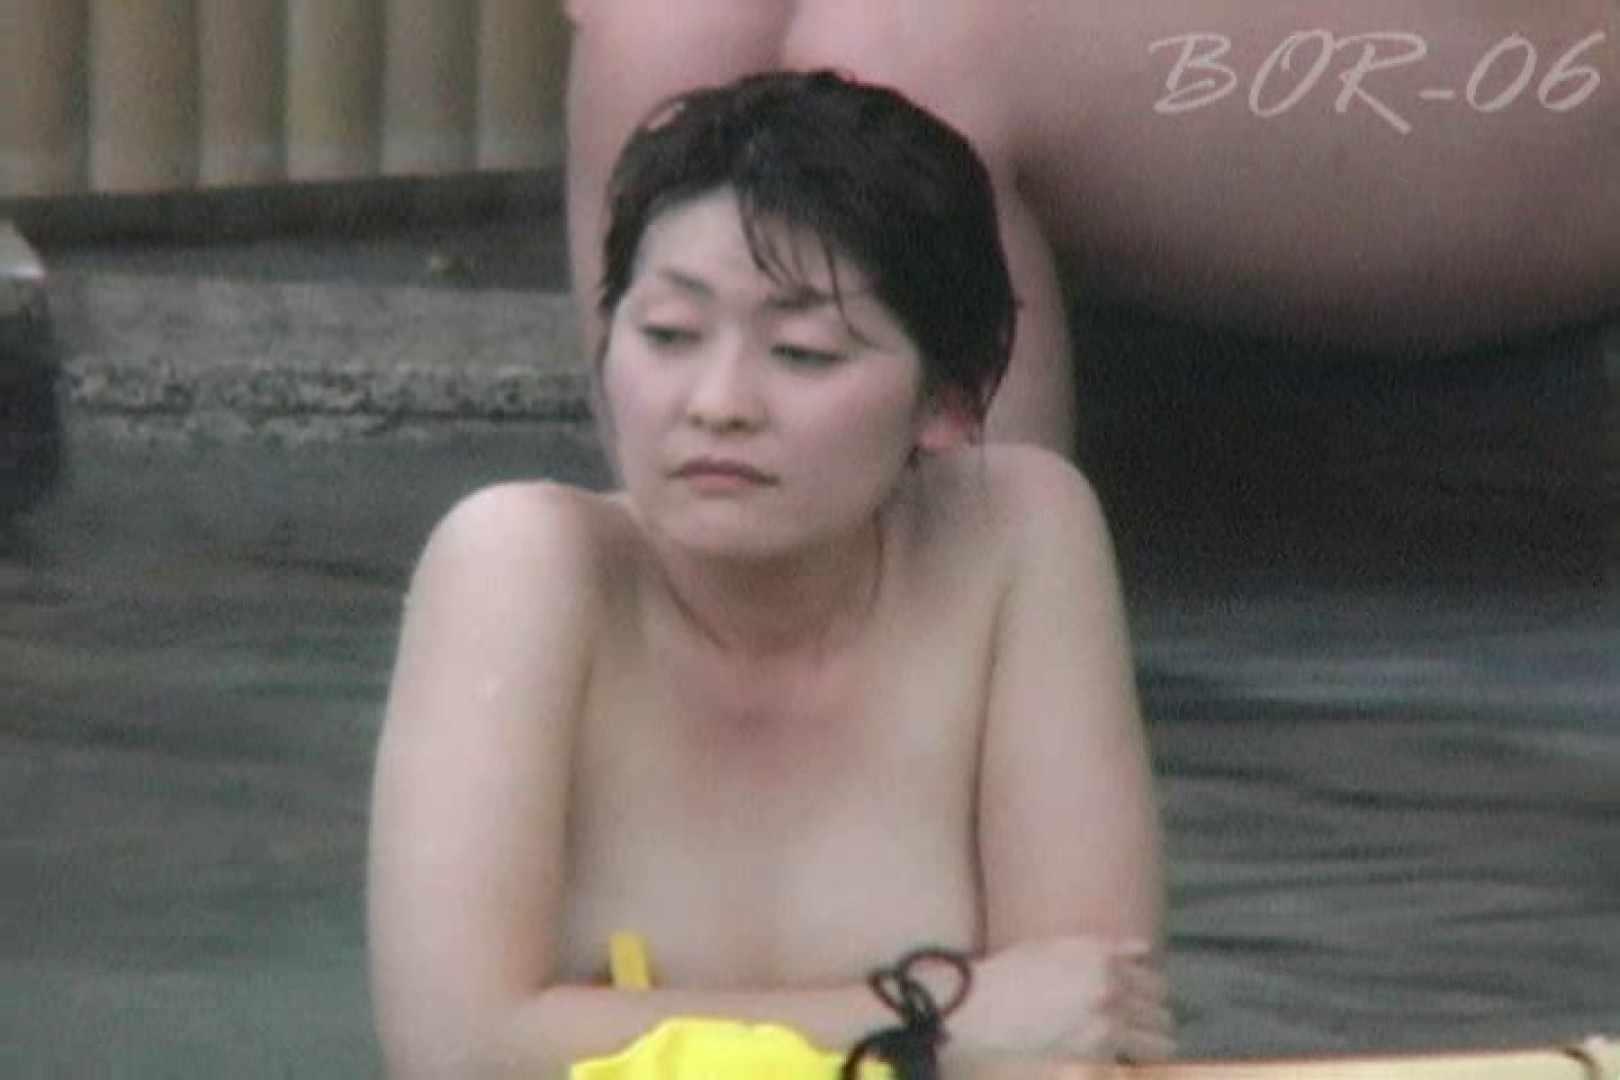 Aquaな露天風呂Vol.523 盗撮 ワレメ無修正動画無料 88枚 26